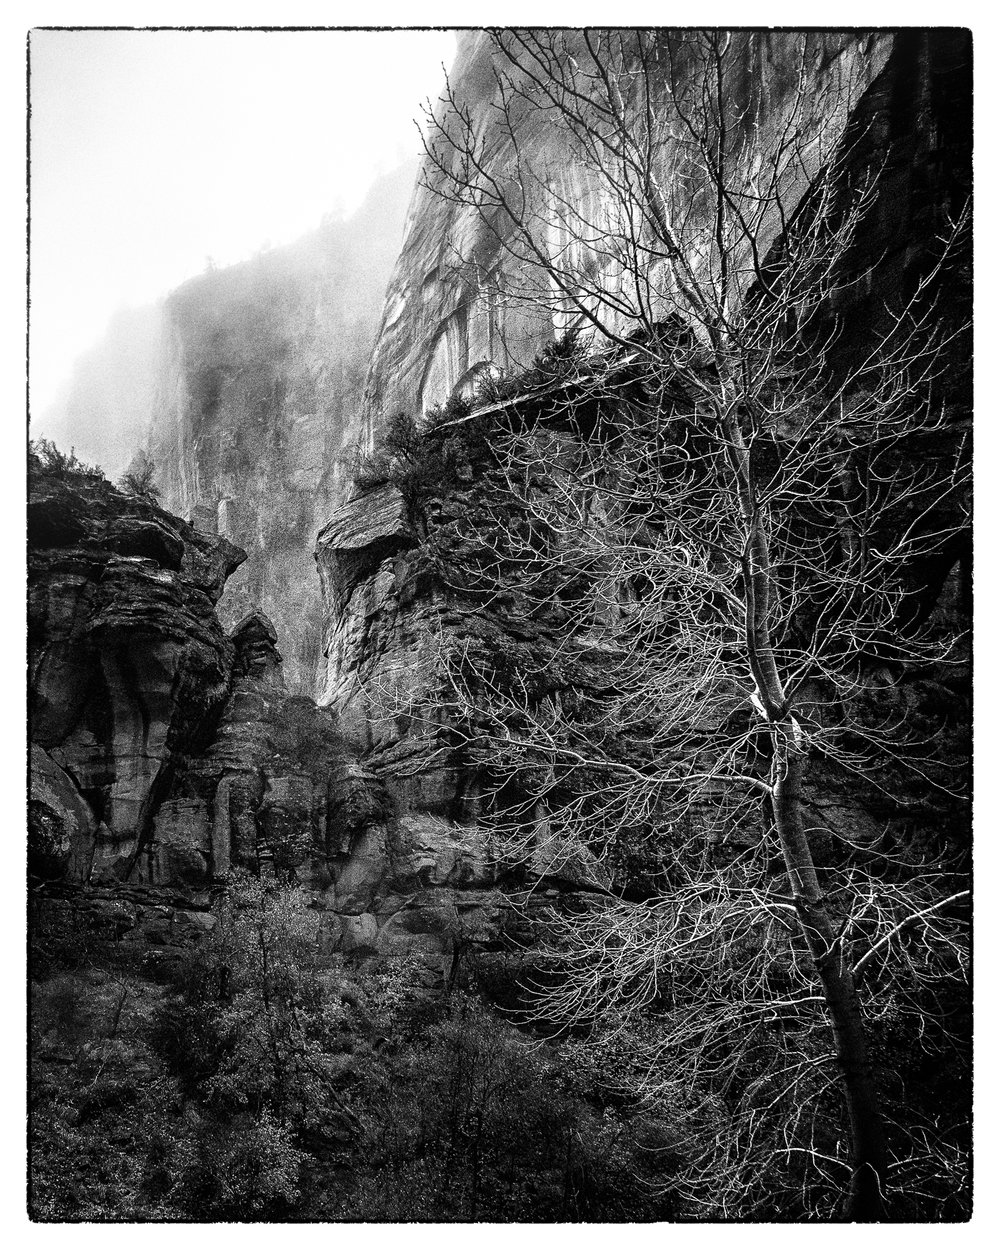 Yosemite-Zion-18.jpg